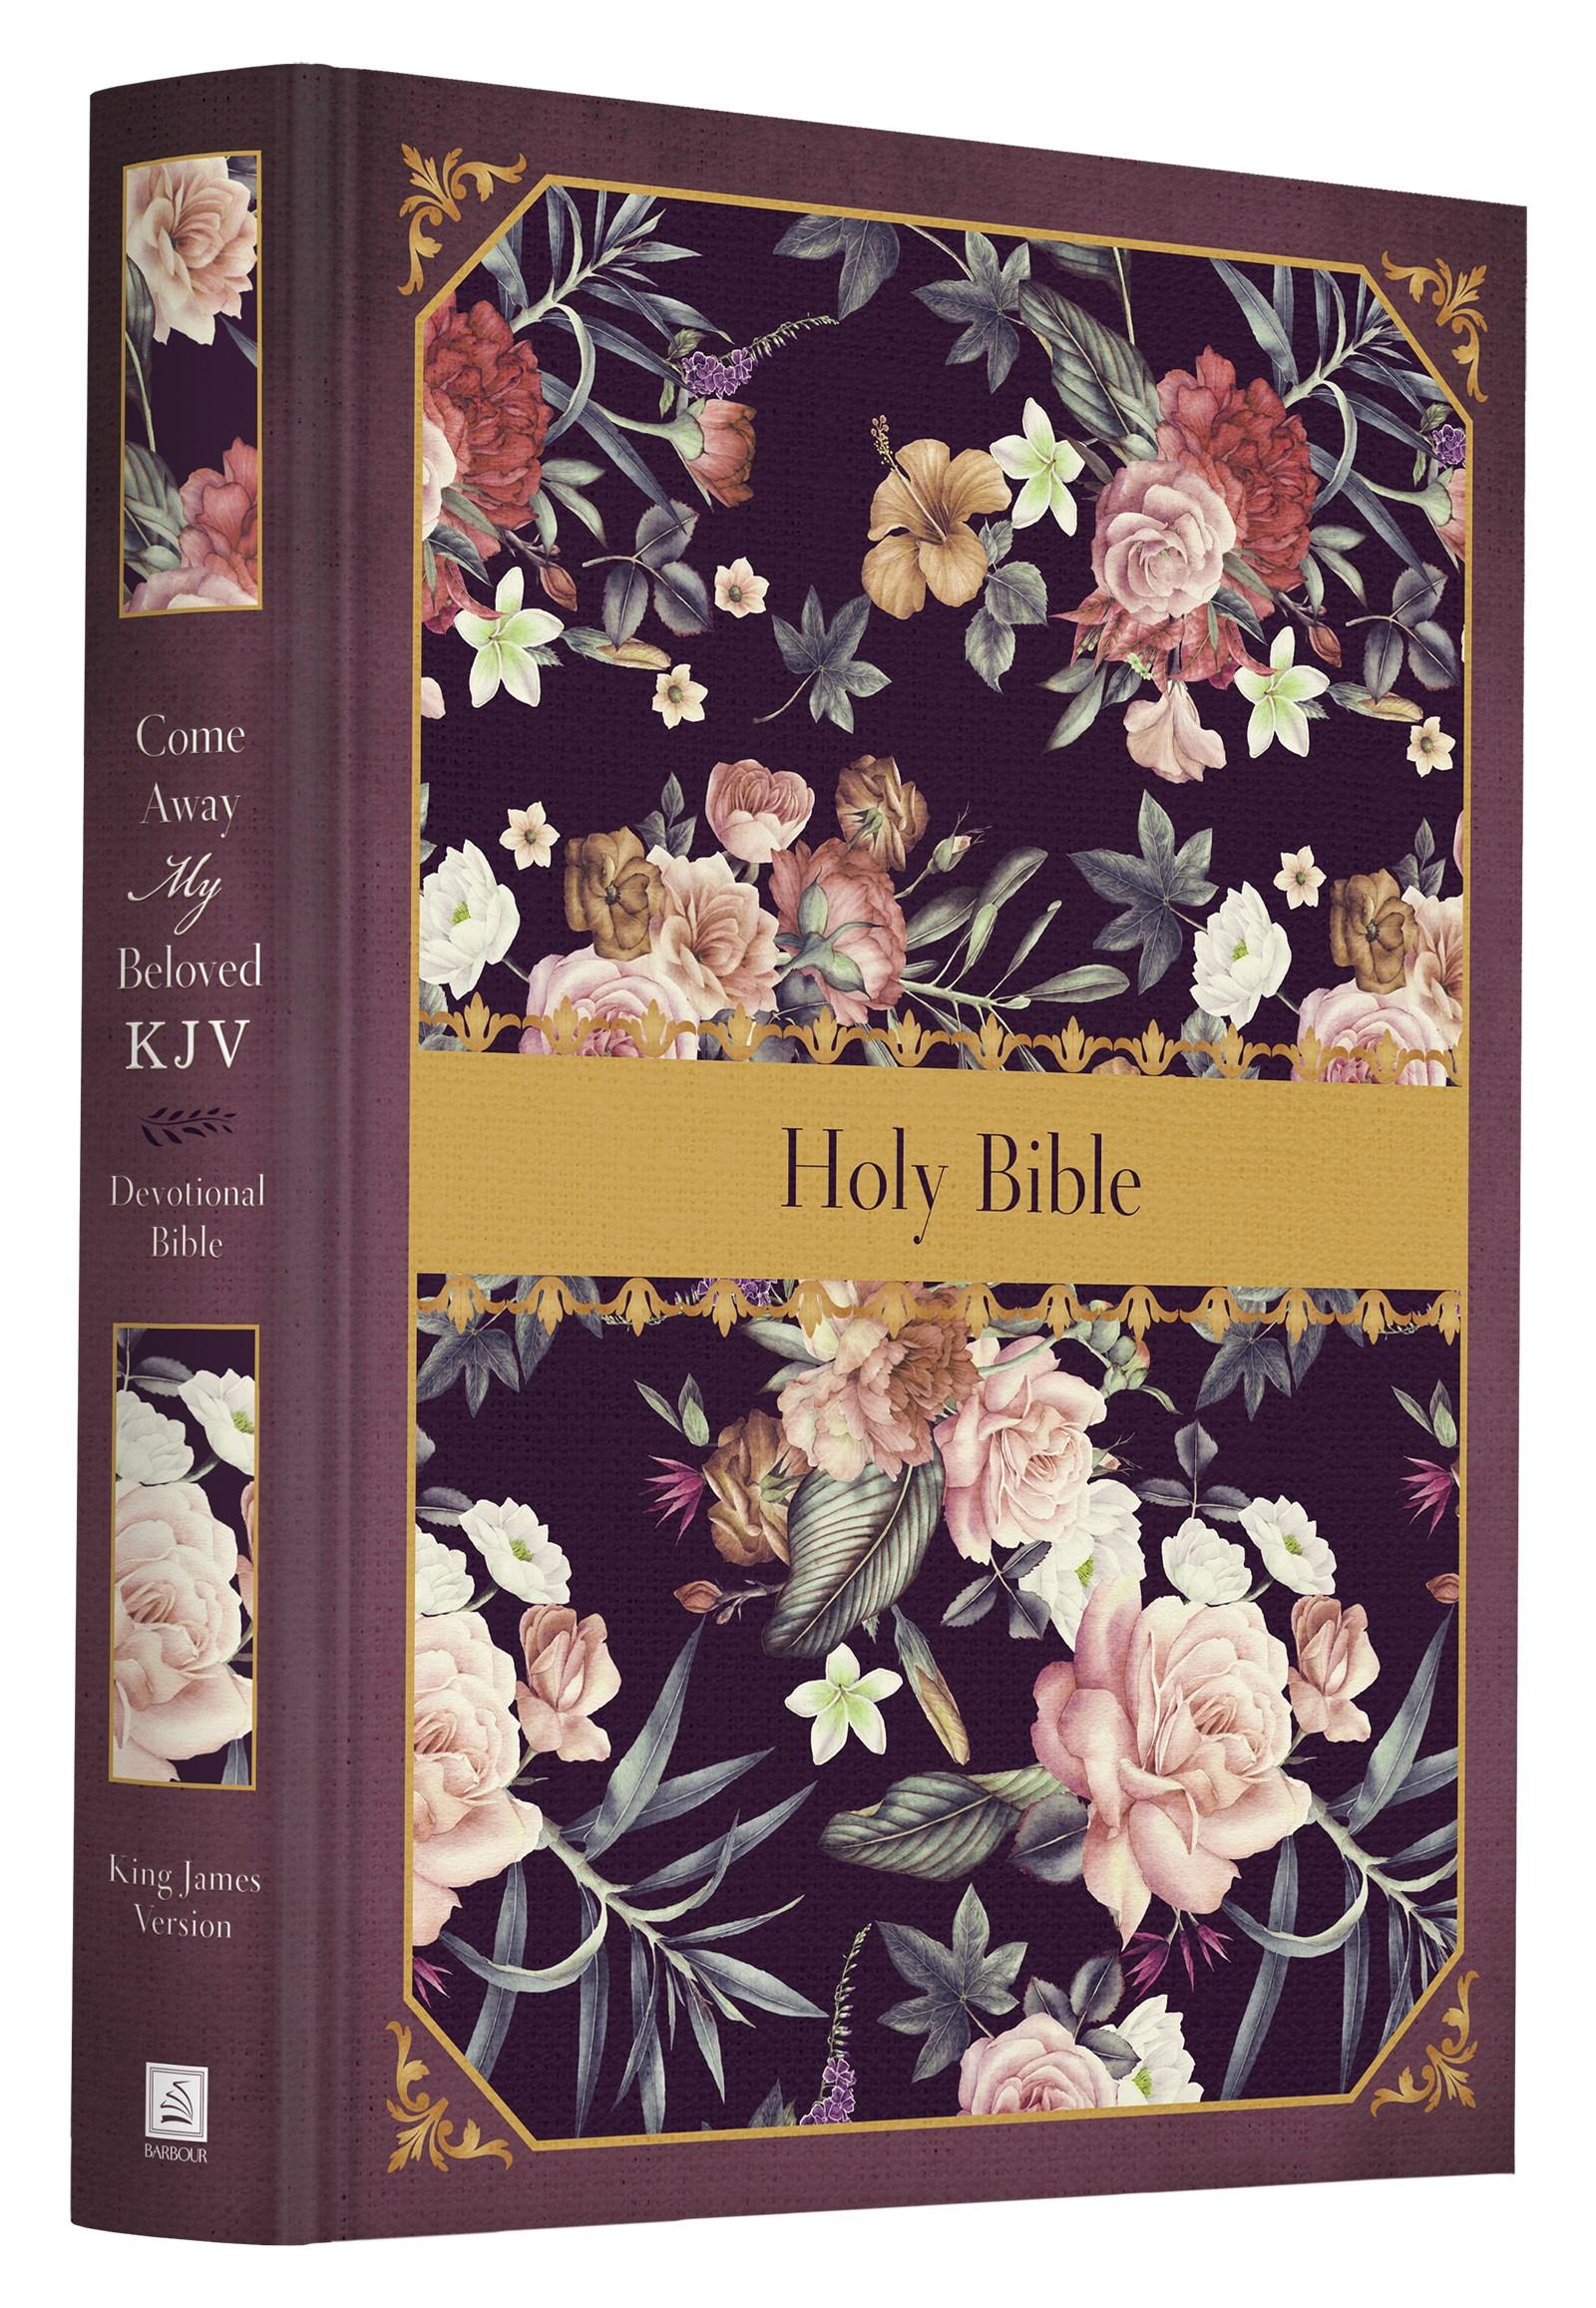 KJV Come Away My Beloved Devotional Bible-Hardcover